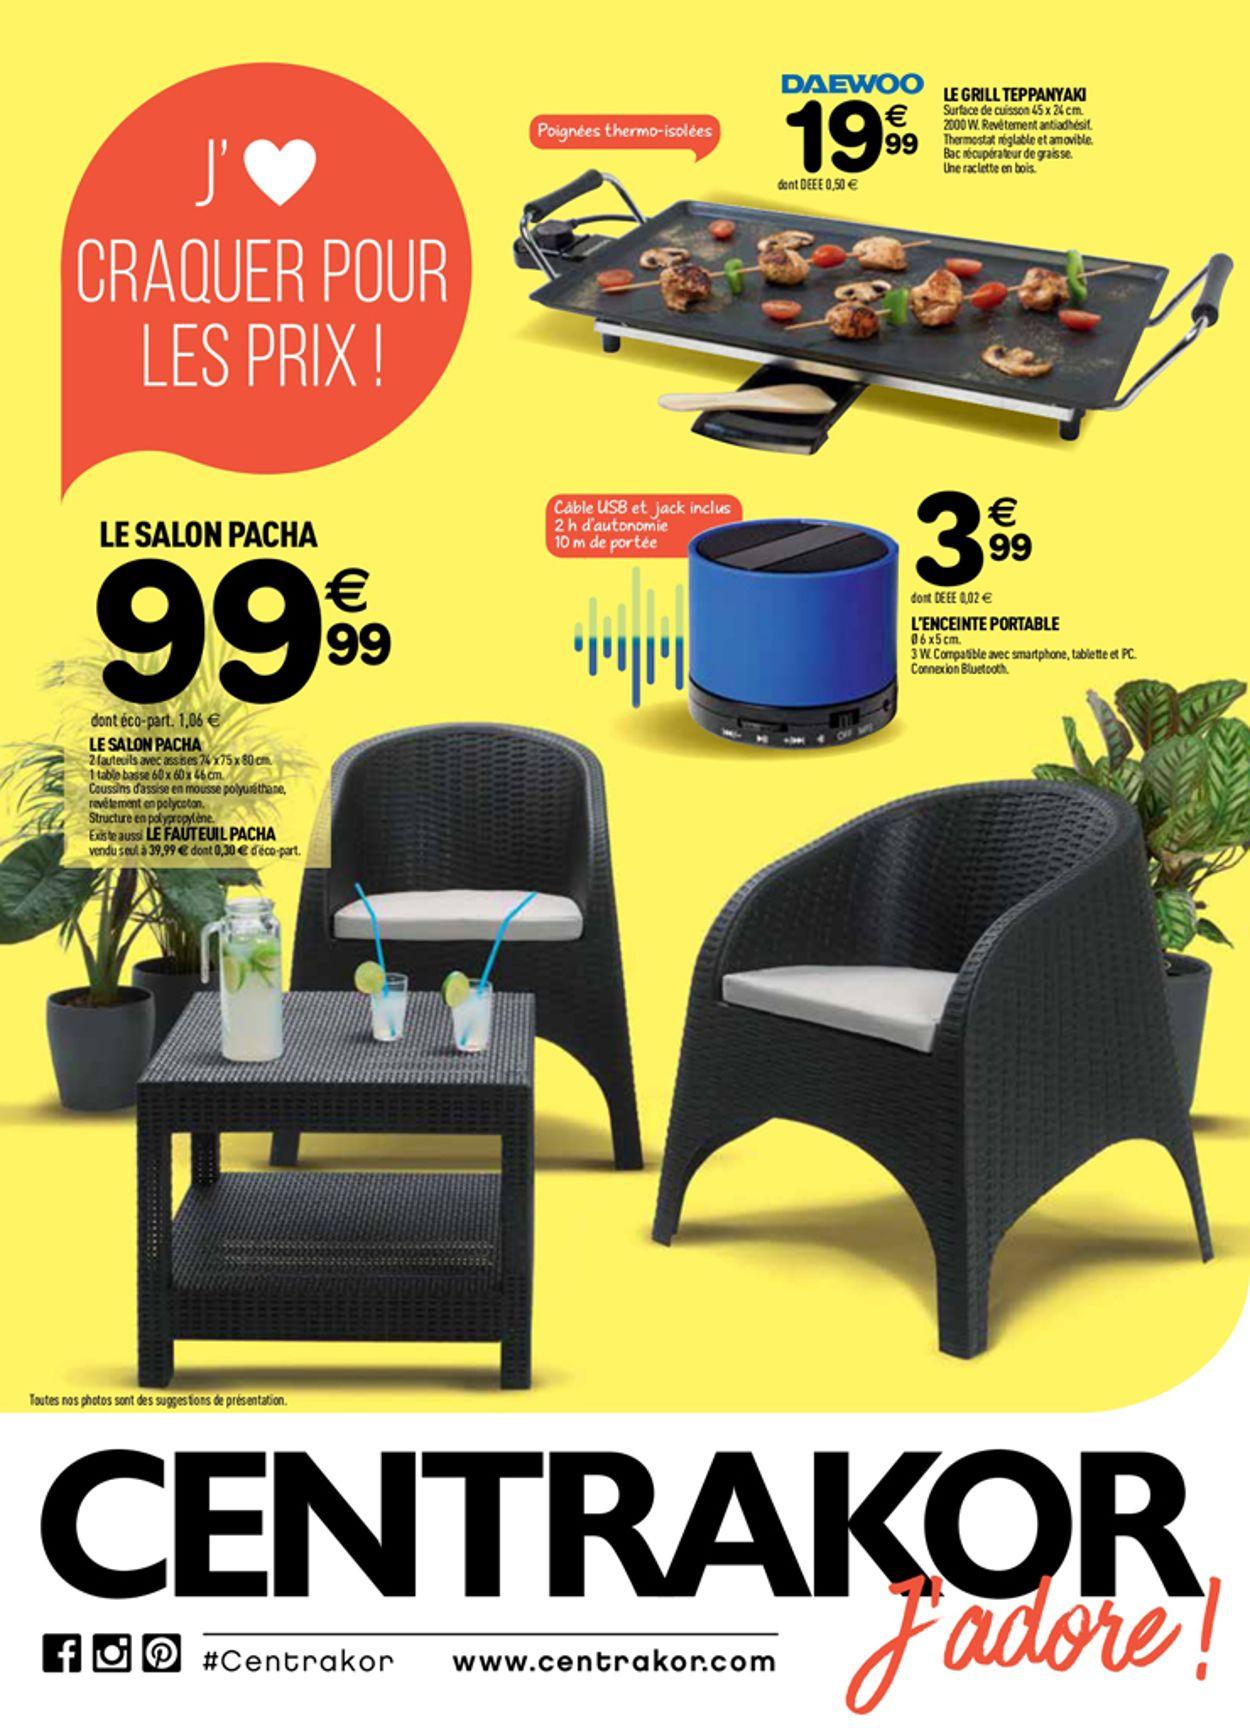 Centrakor Catalogue Actuel 01.07 - 14.07.2019 - Catalogue-24 pour Table De Jardin Centrakor